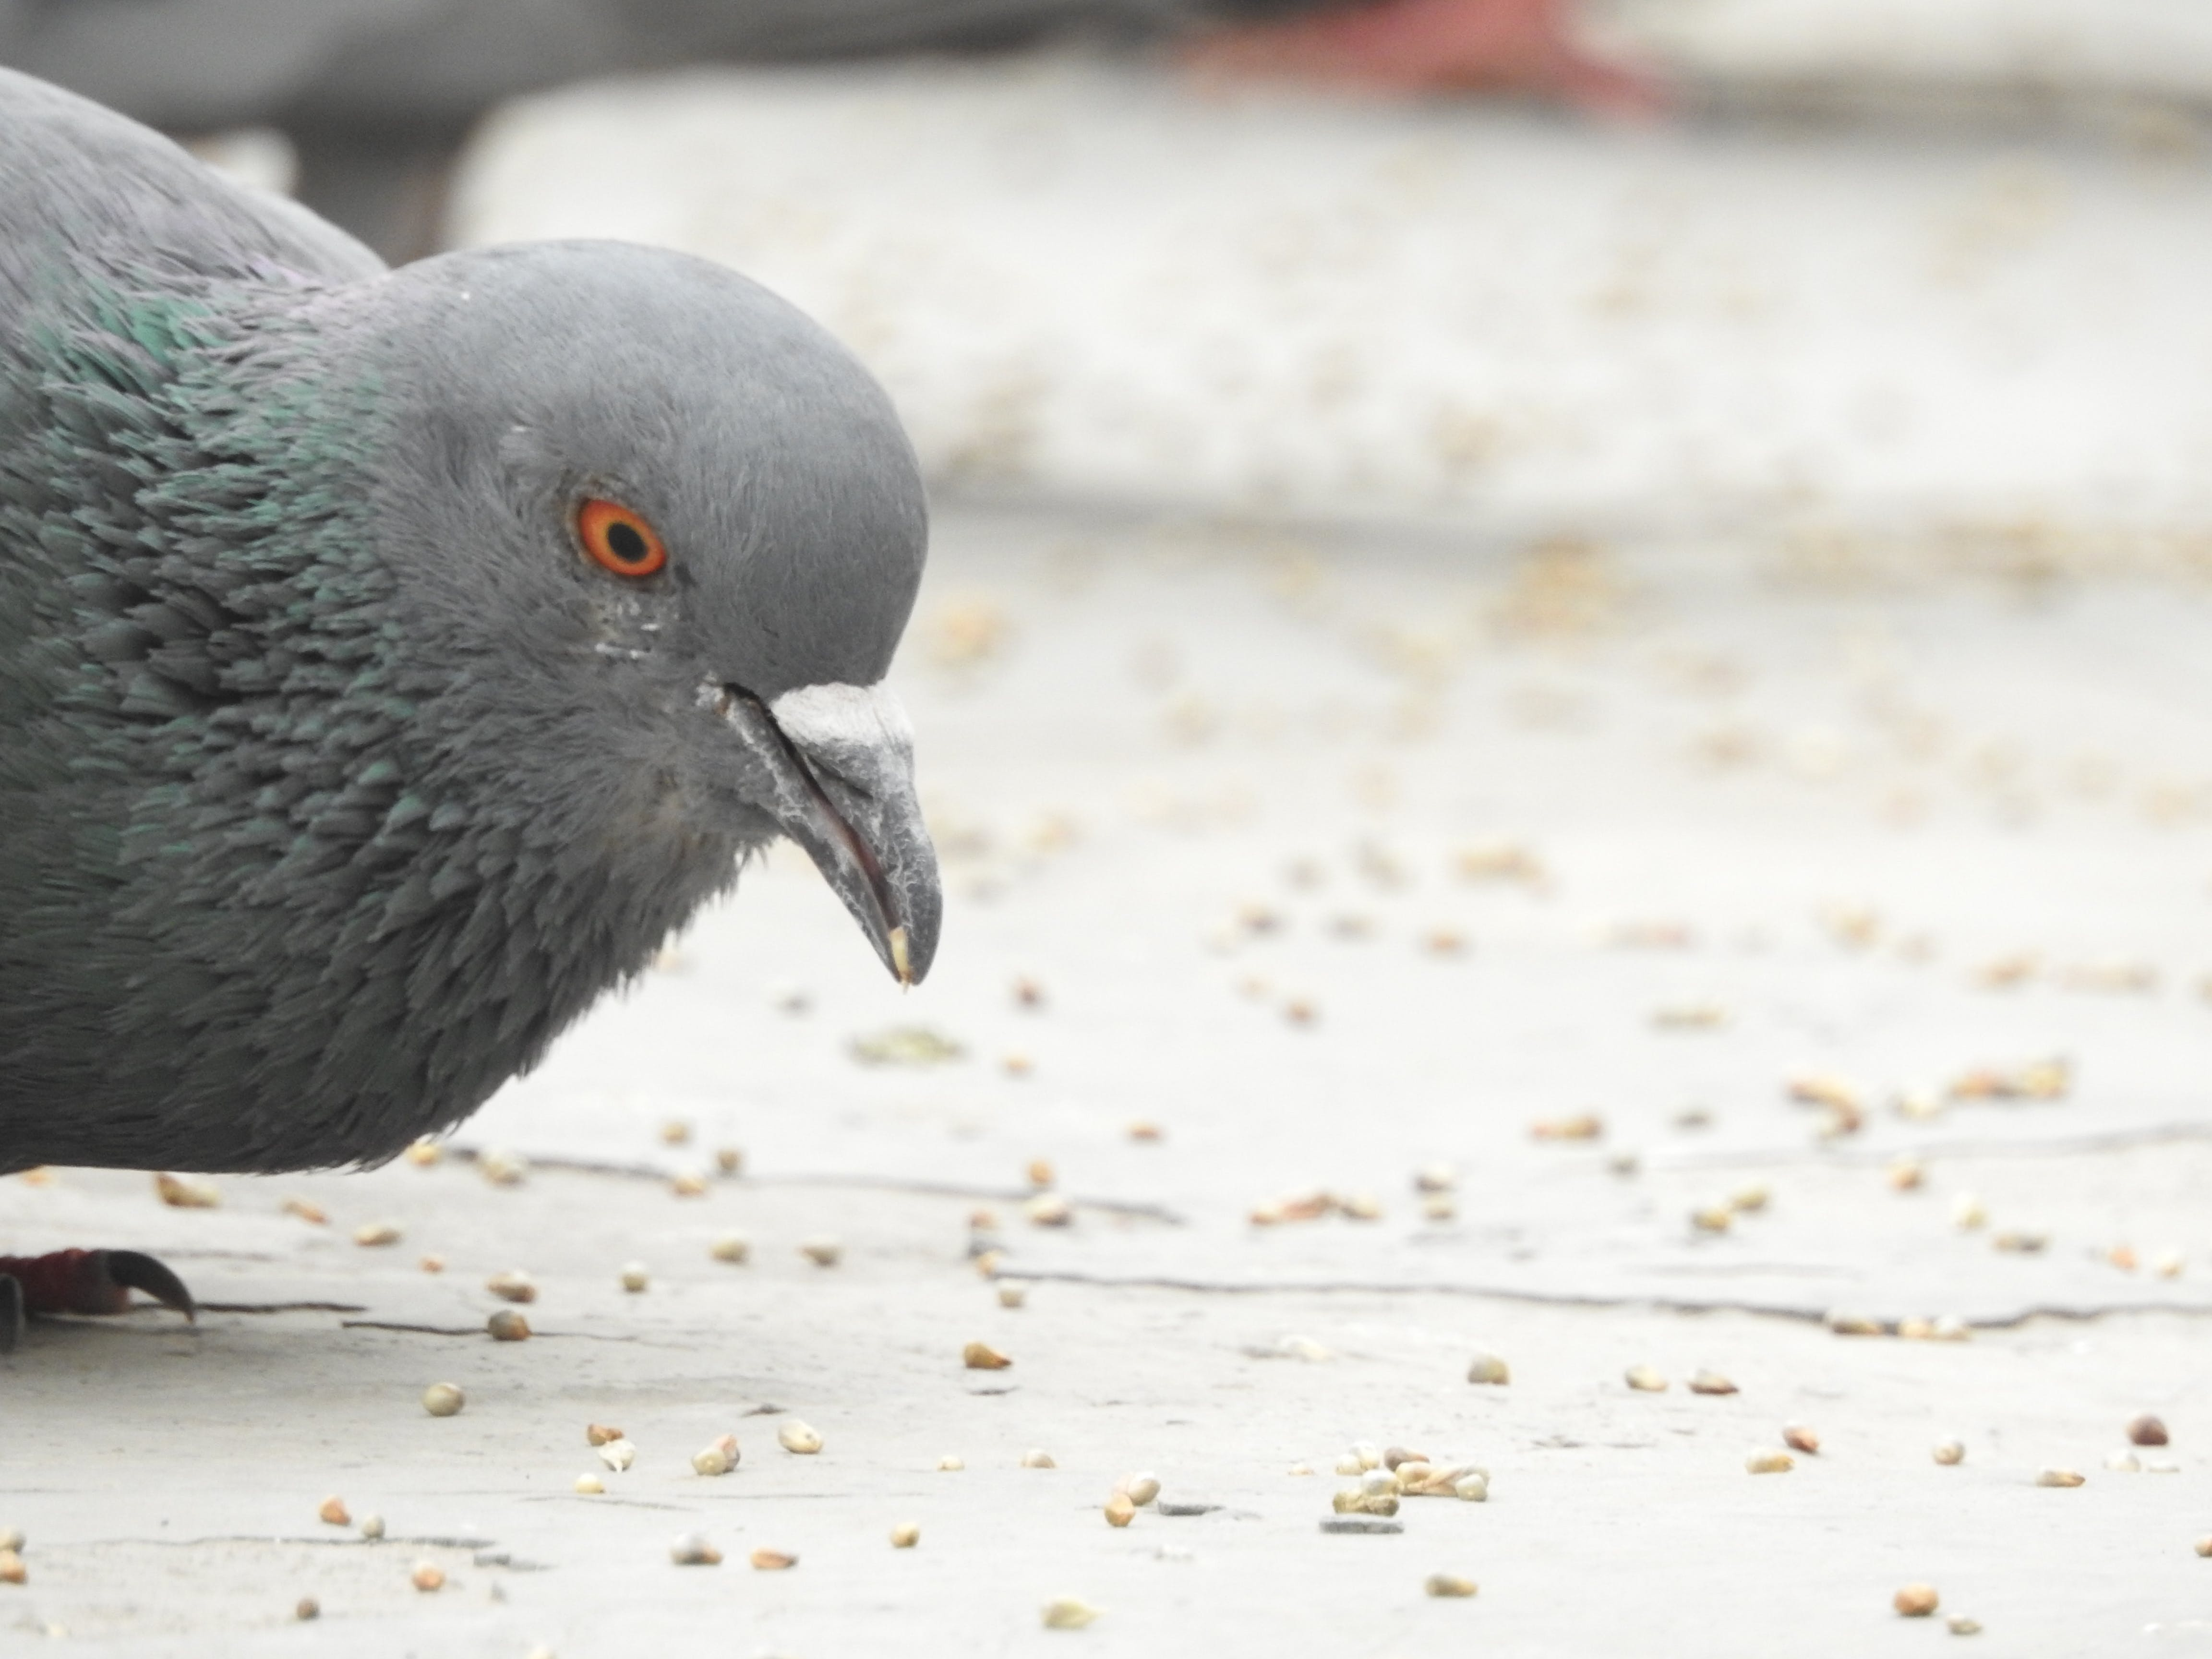 Free stock photo of #bird, bird feeder, pigeon